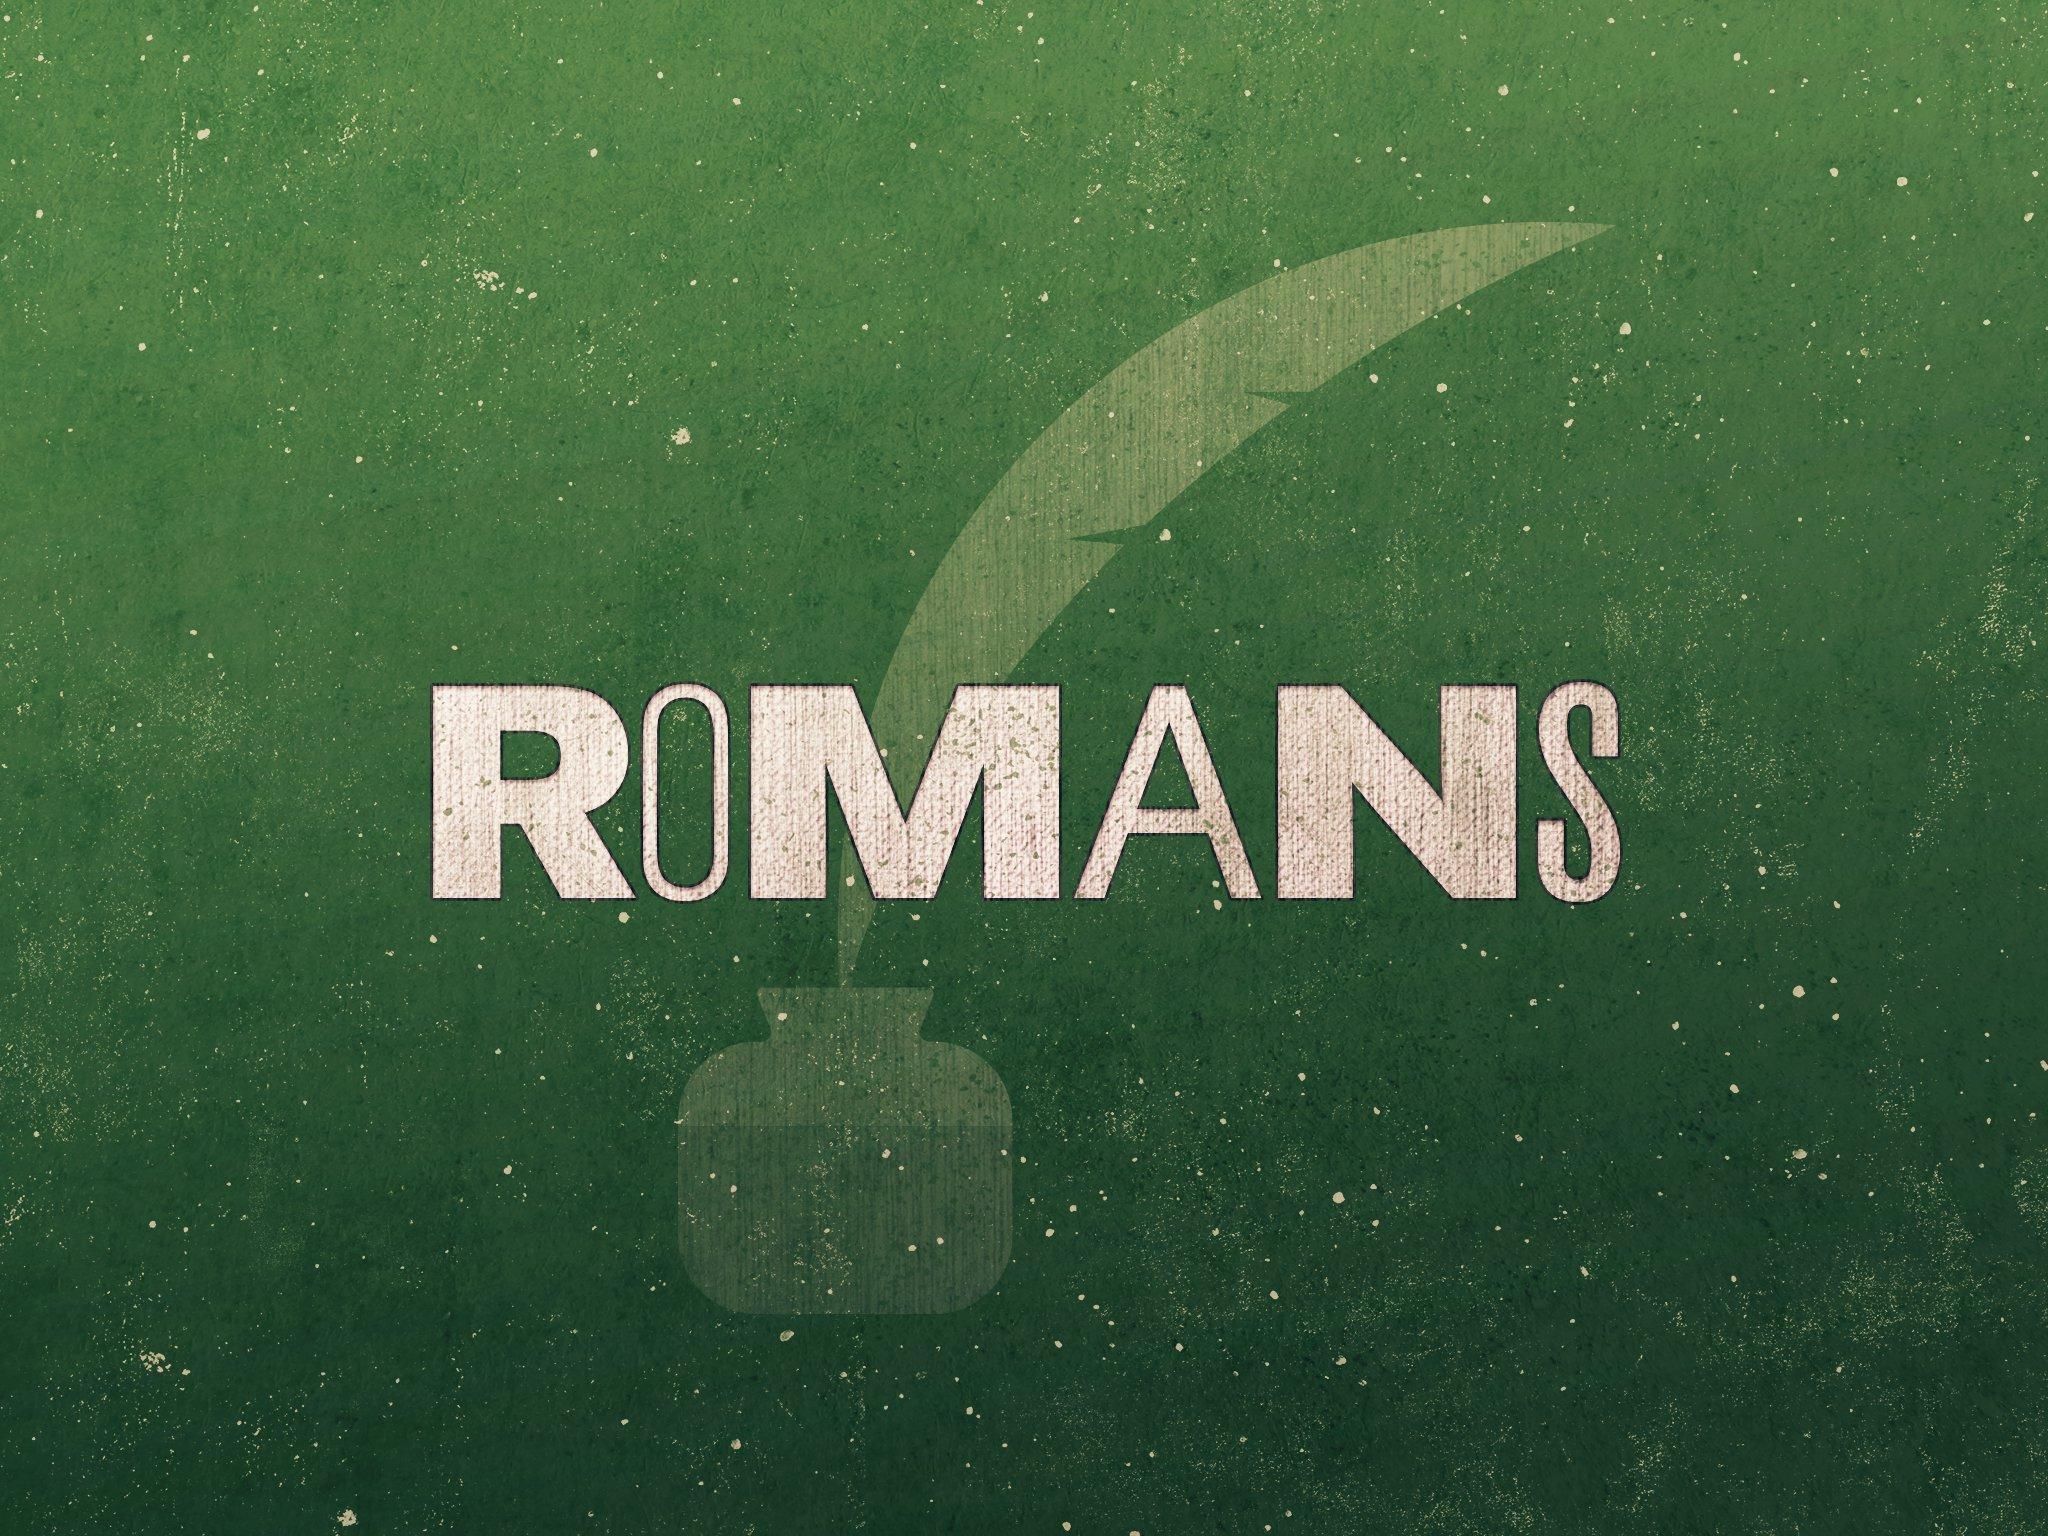 45-Romans_Title_4x3-fullscreen.jpg